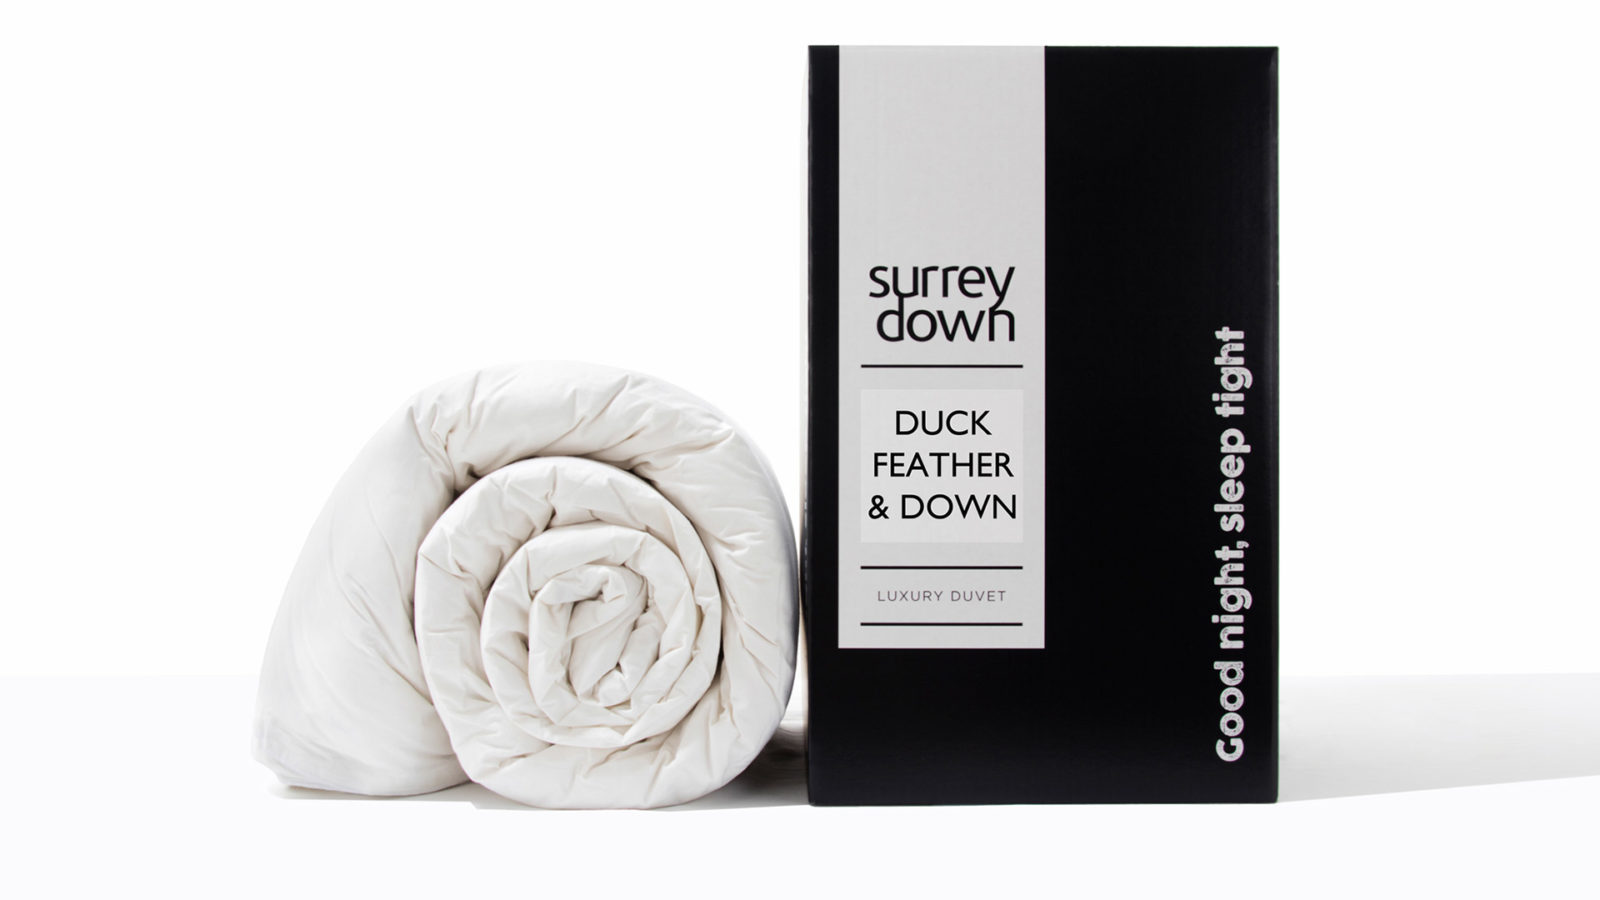 Duck-Feather-&-Down duvet